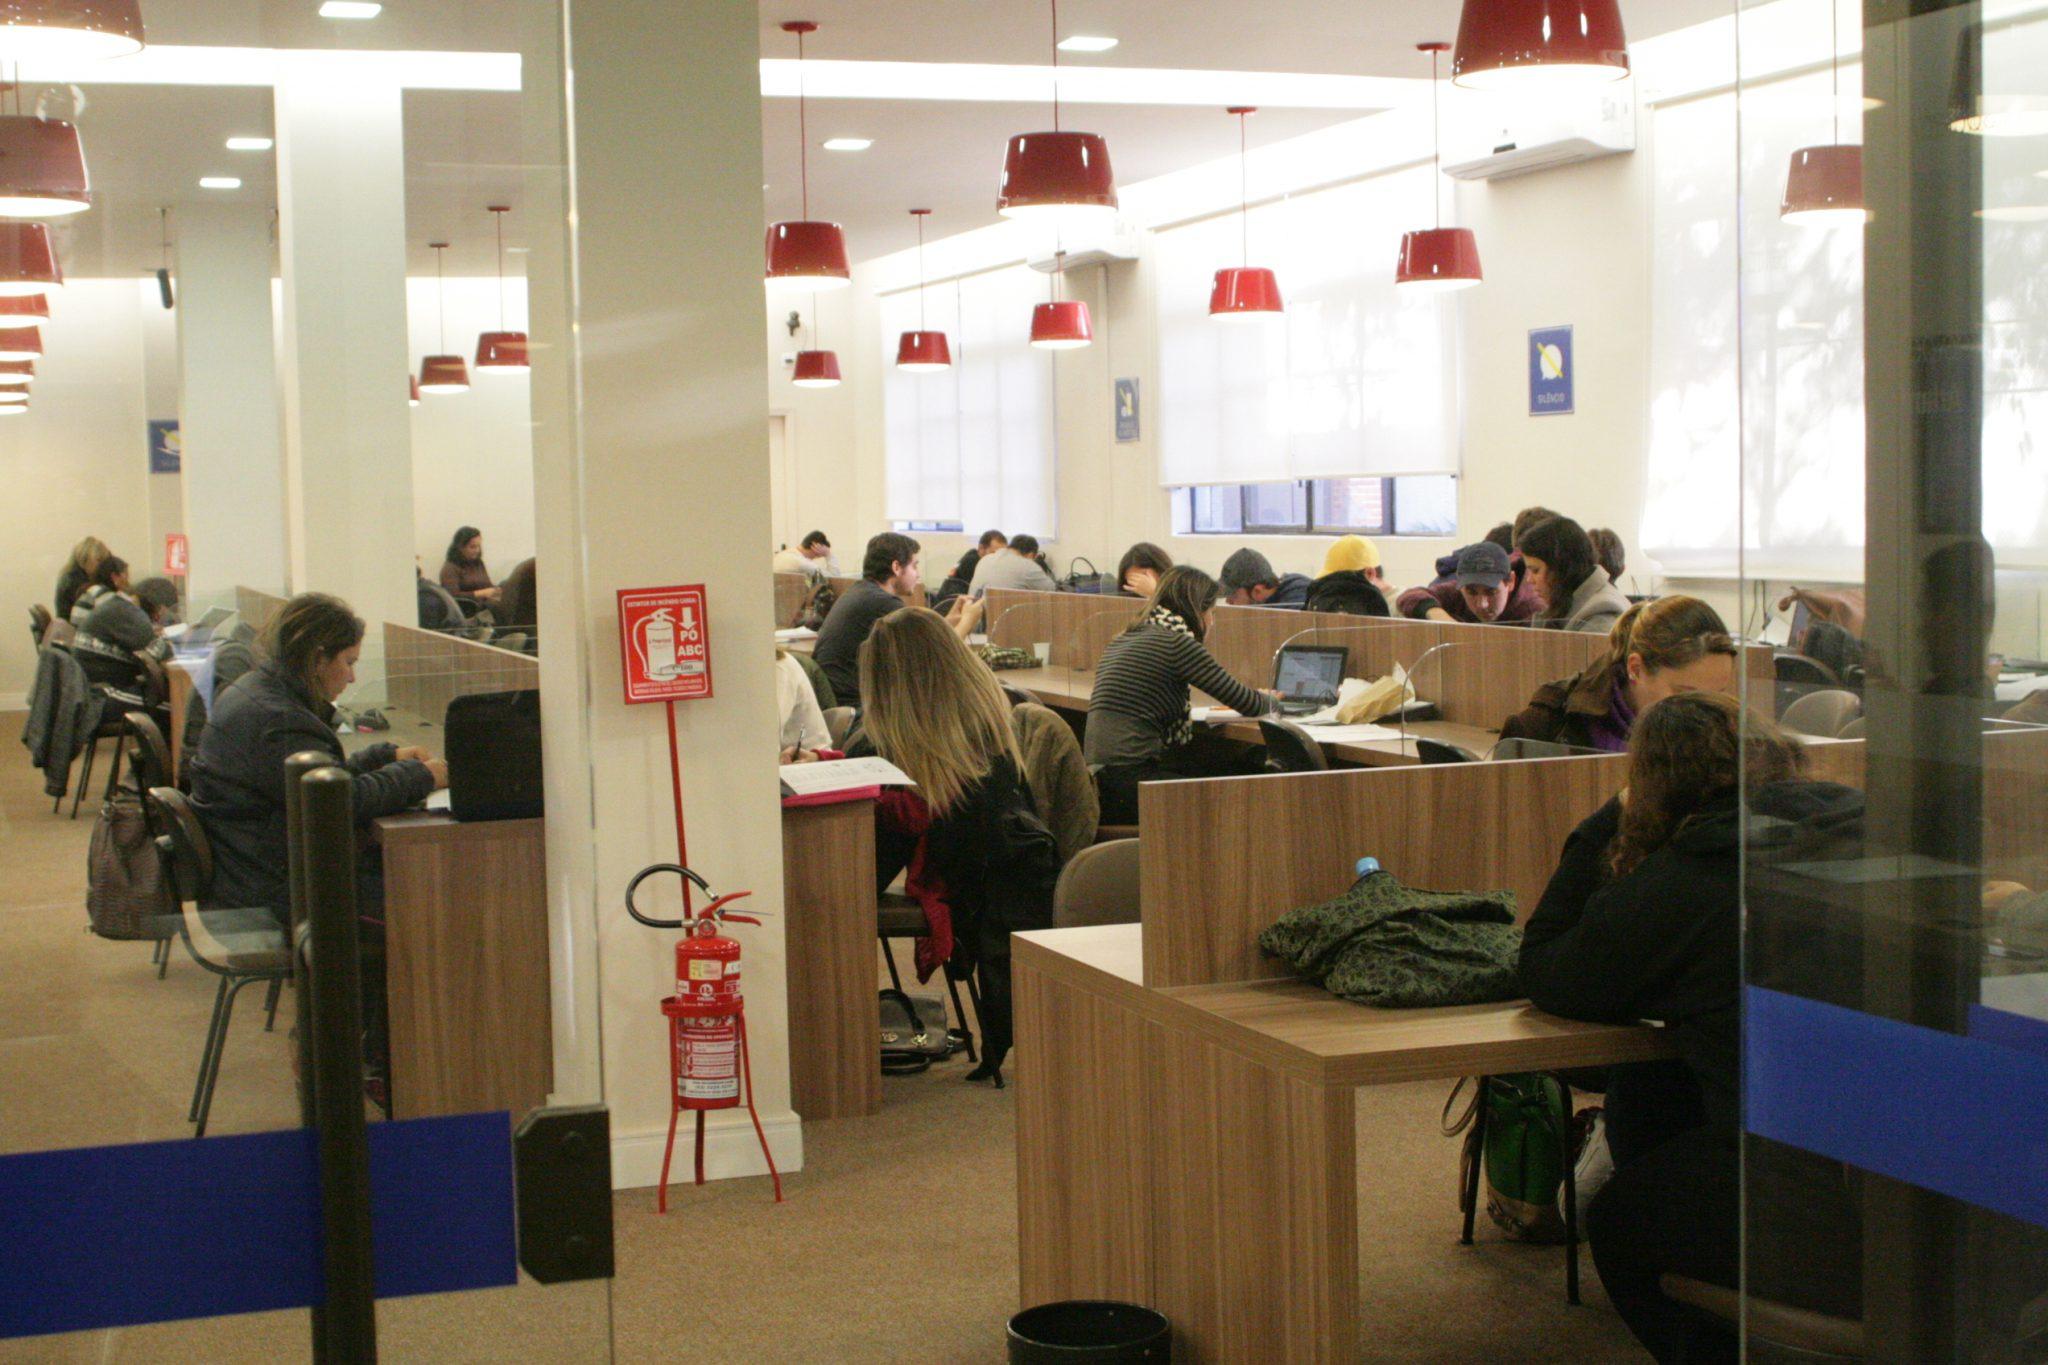 alunos-na-biblioteca-ucpel-universidade-estudar